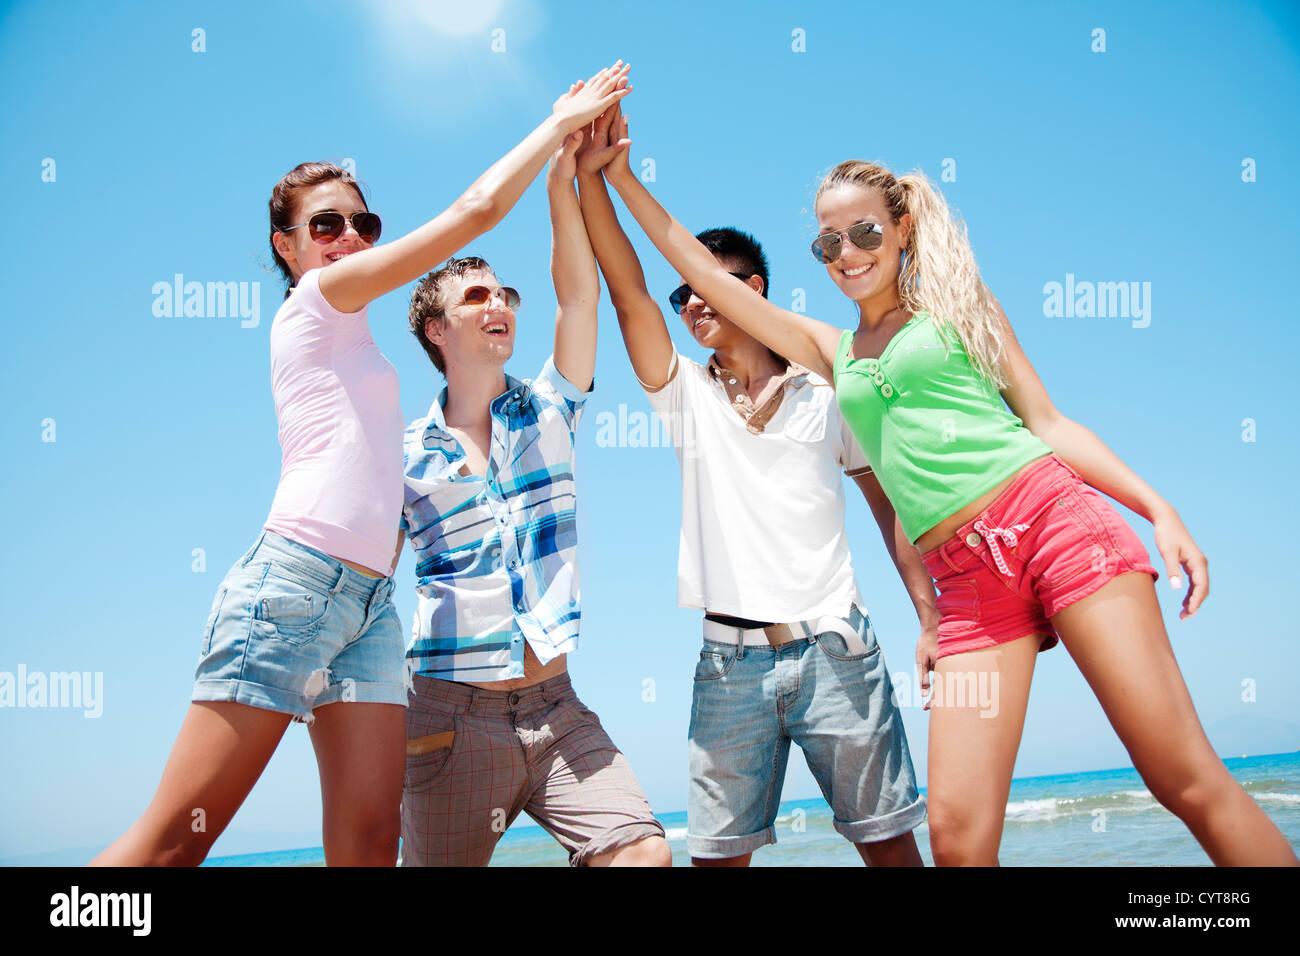 unity - Stock Image